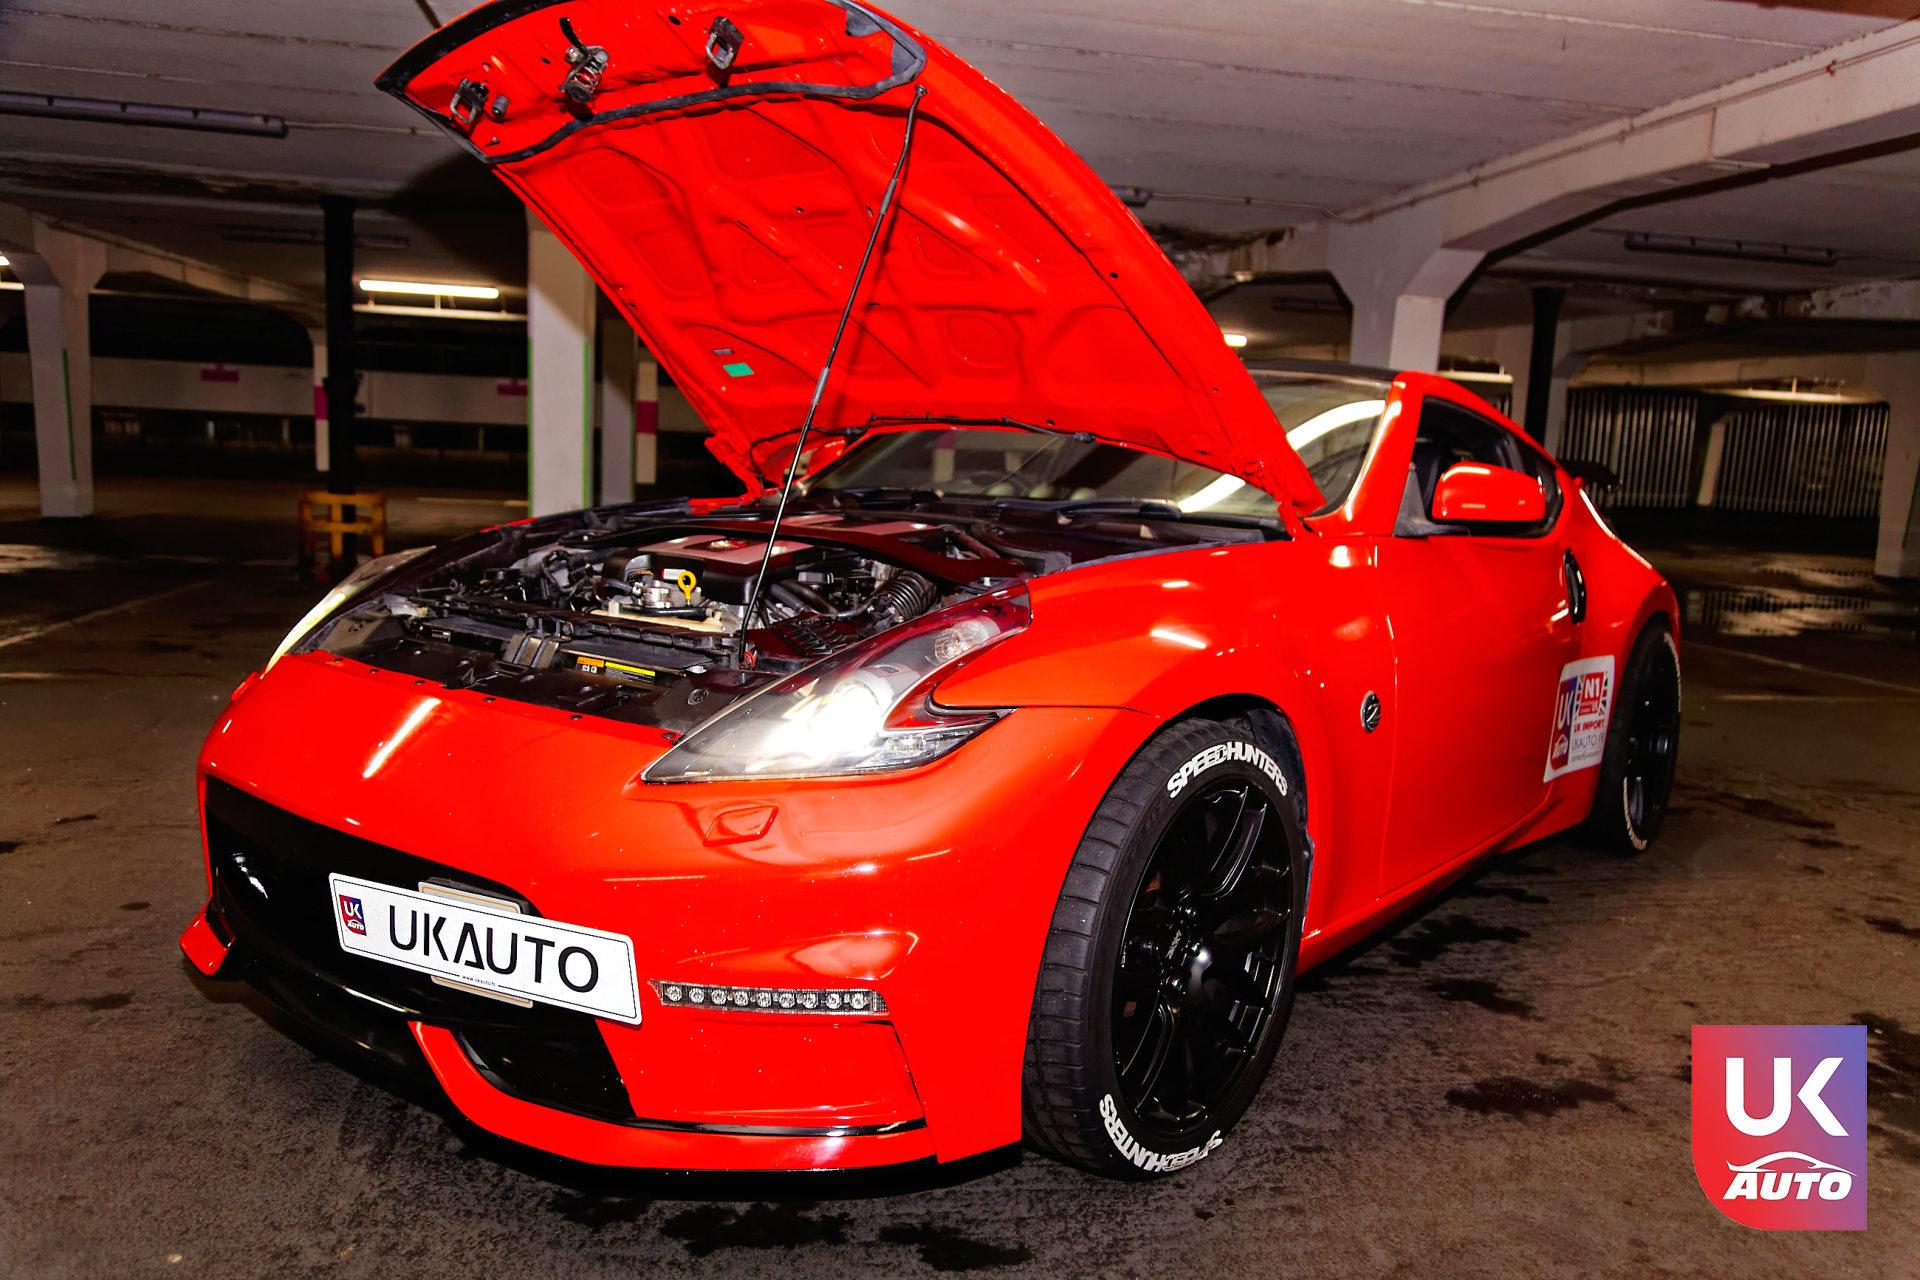 Nissan 370Z SUPERCHARGED UK IMPORTATION VOITURE ANGLAISE NISSAN ANGLETERRE NISSAN UK UKAUTO13 DxO - IMPORTATION NISSAN ANGLETERRE NISSAN 370Z V6 RHD VOITURE ANGLAISE SPORTIVE